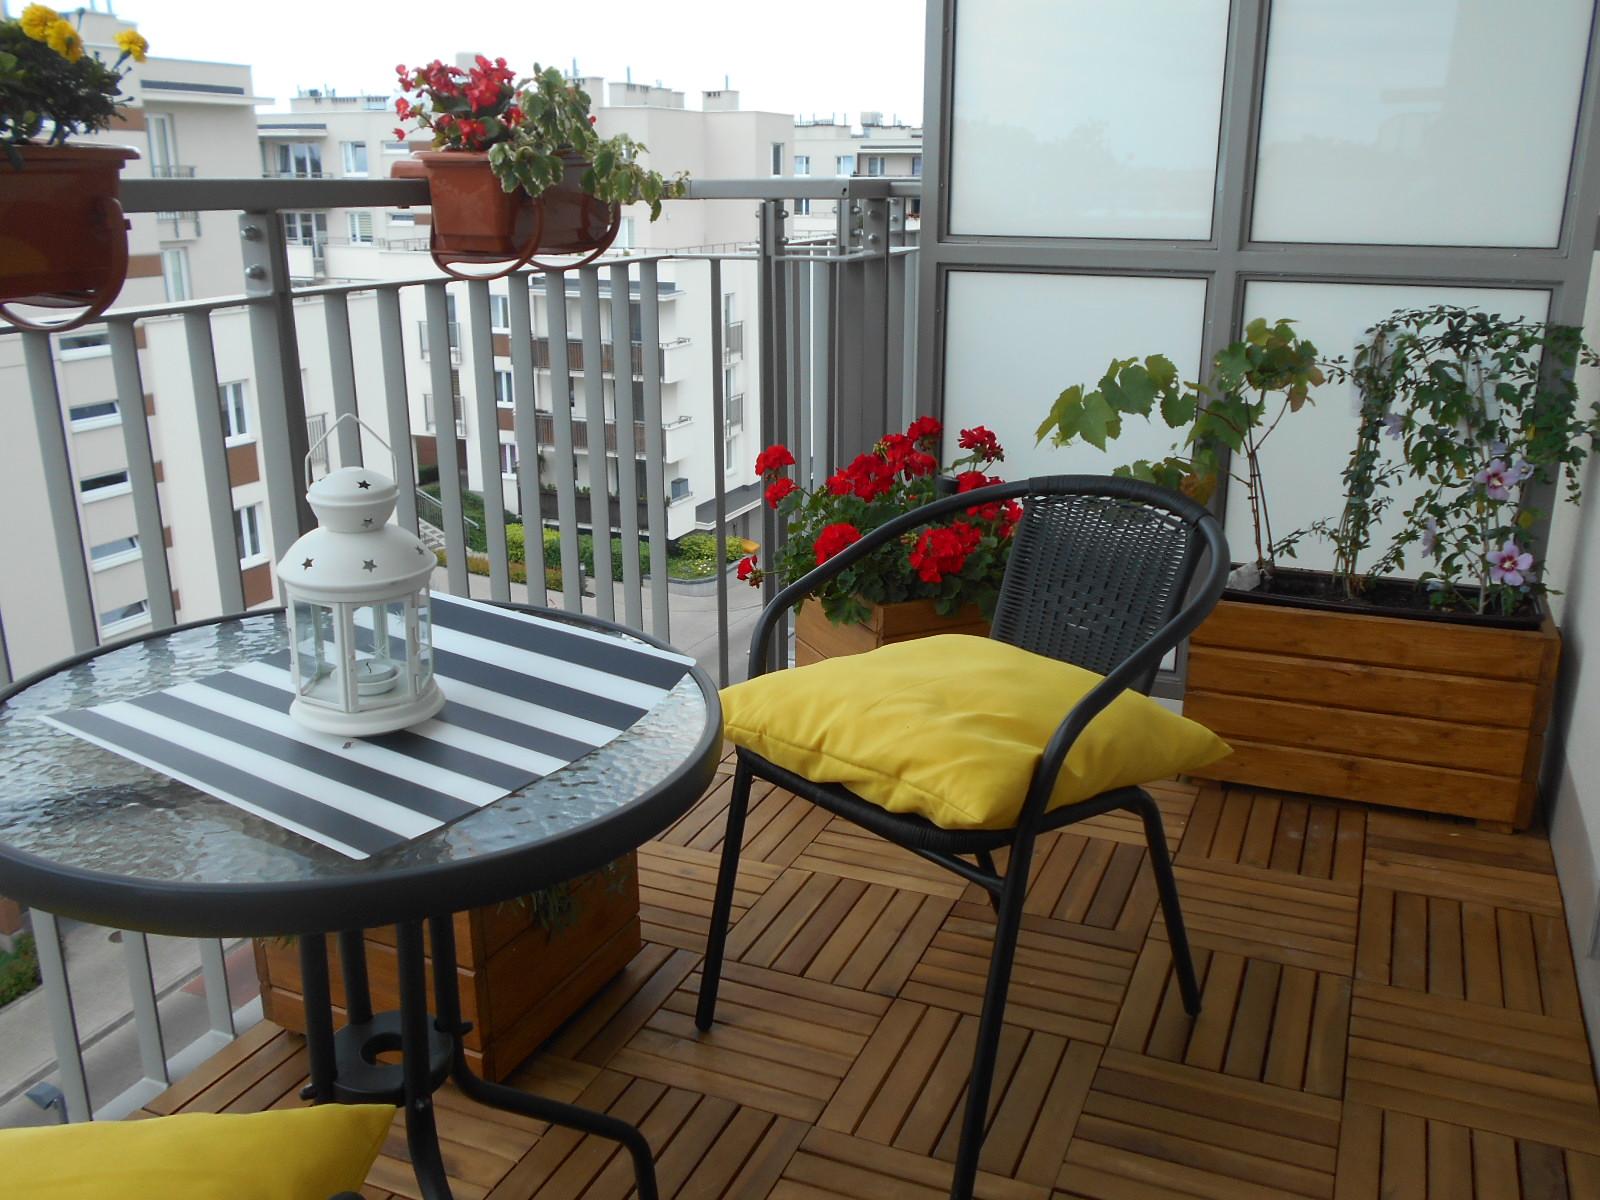 podr e gotowanie lifestyle warszawa jak urz dzi ma y balkon pomys na balkon. Black Bedroom Furniture Sets. Home Design Ideas